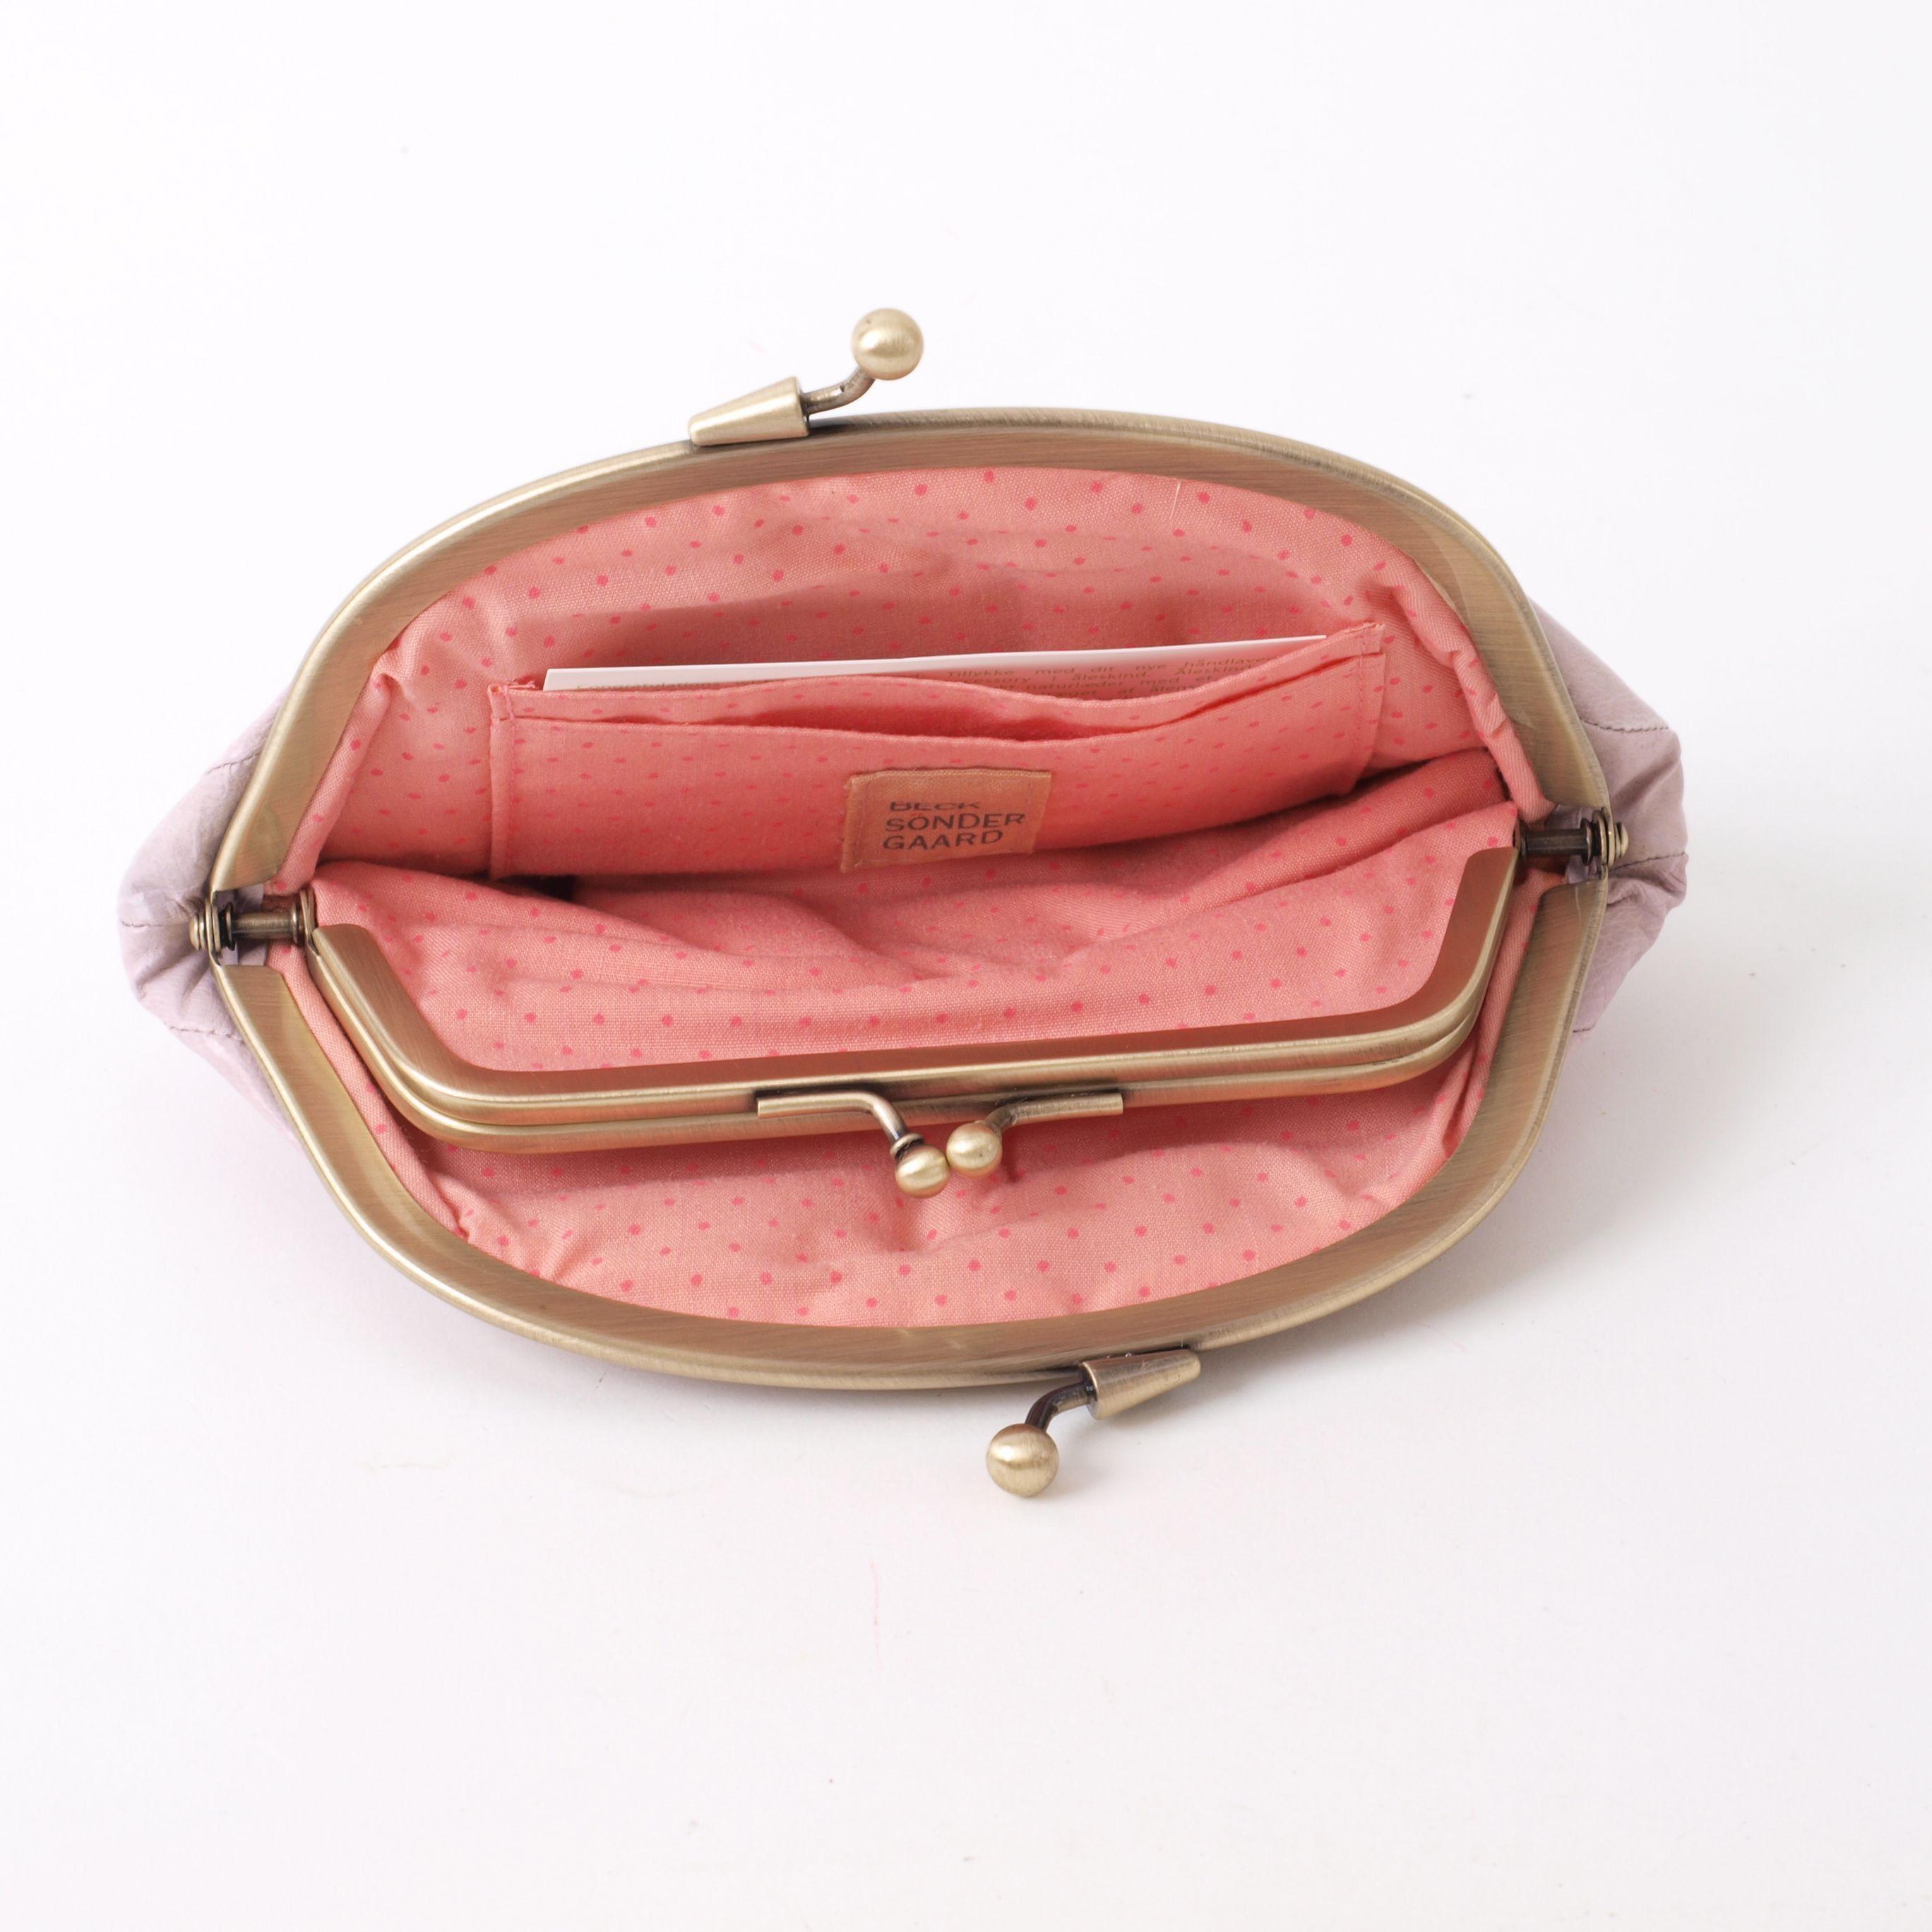 - WIDARO sieraden en accessoires